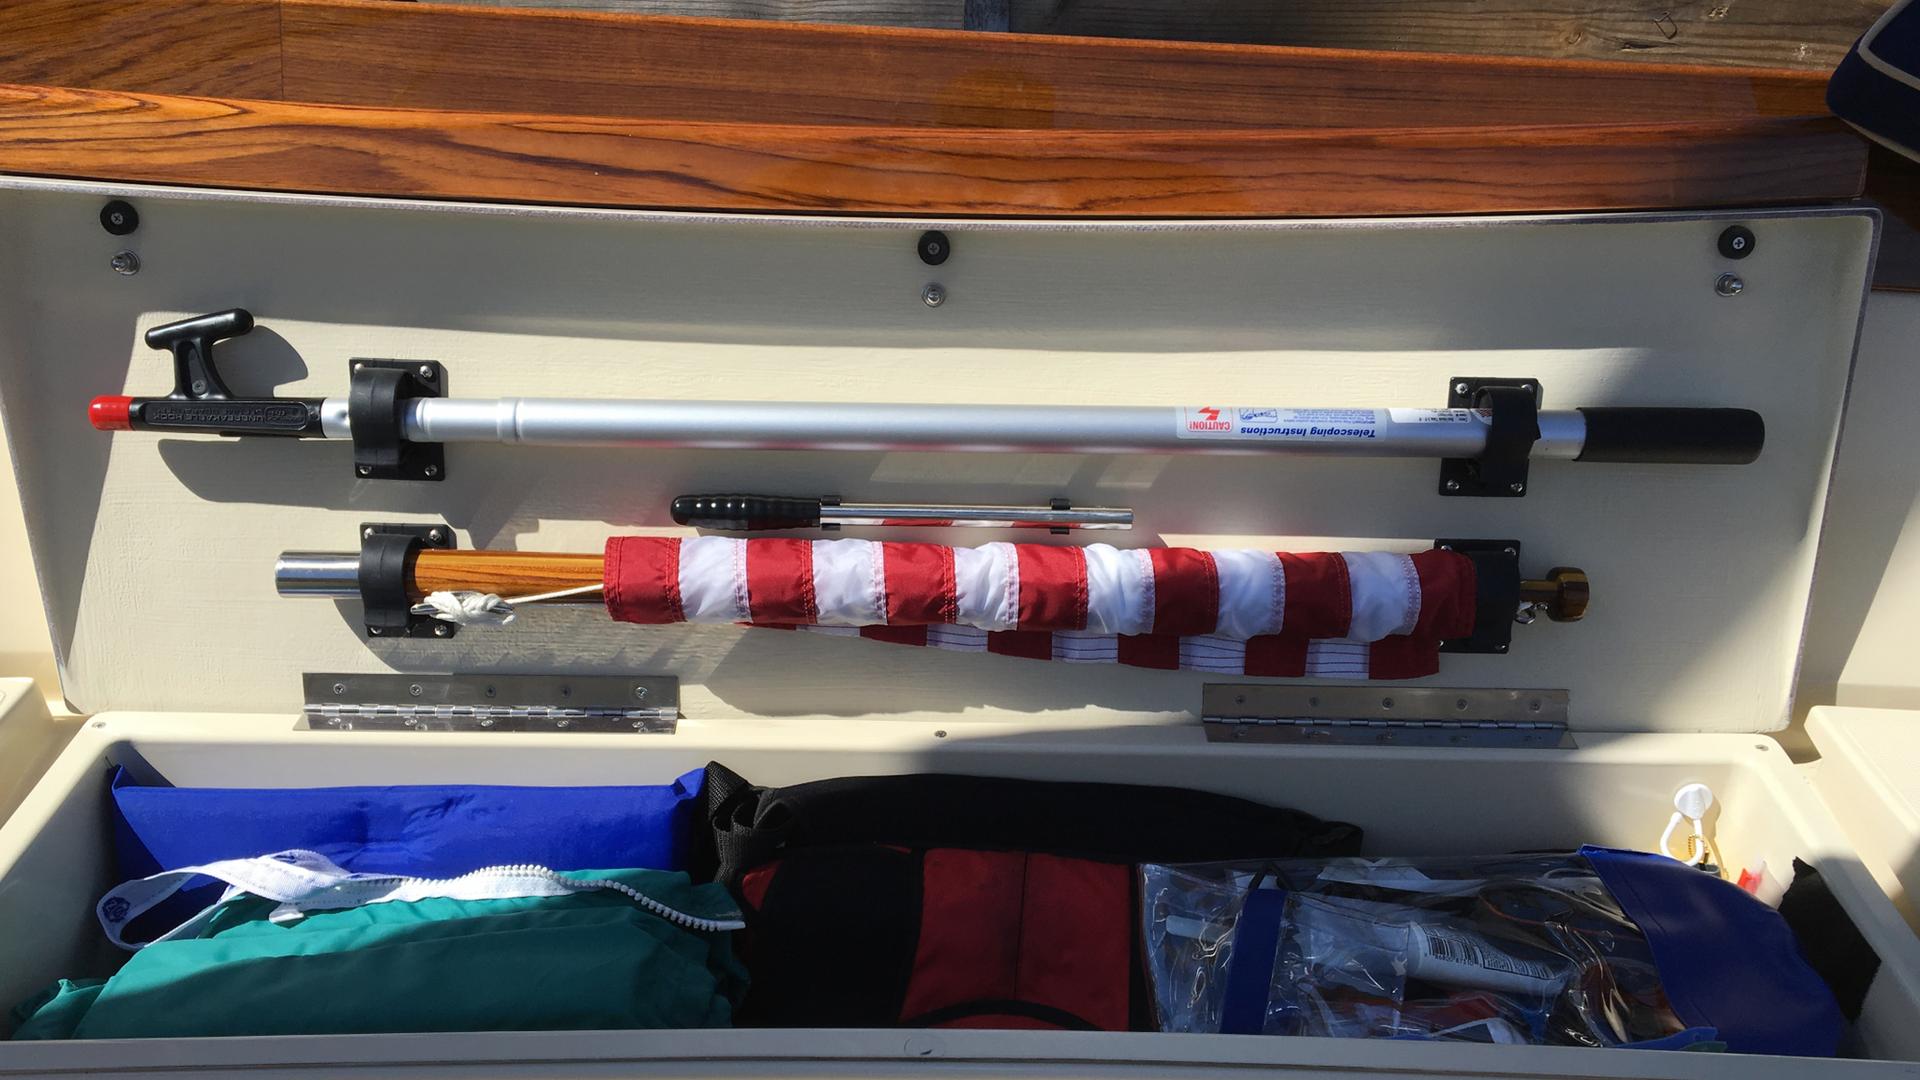 Starboard cockpit locker showing standard placement of boat hook, manual bilge pump handle and ensign pole.